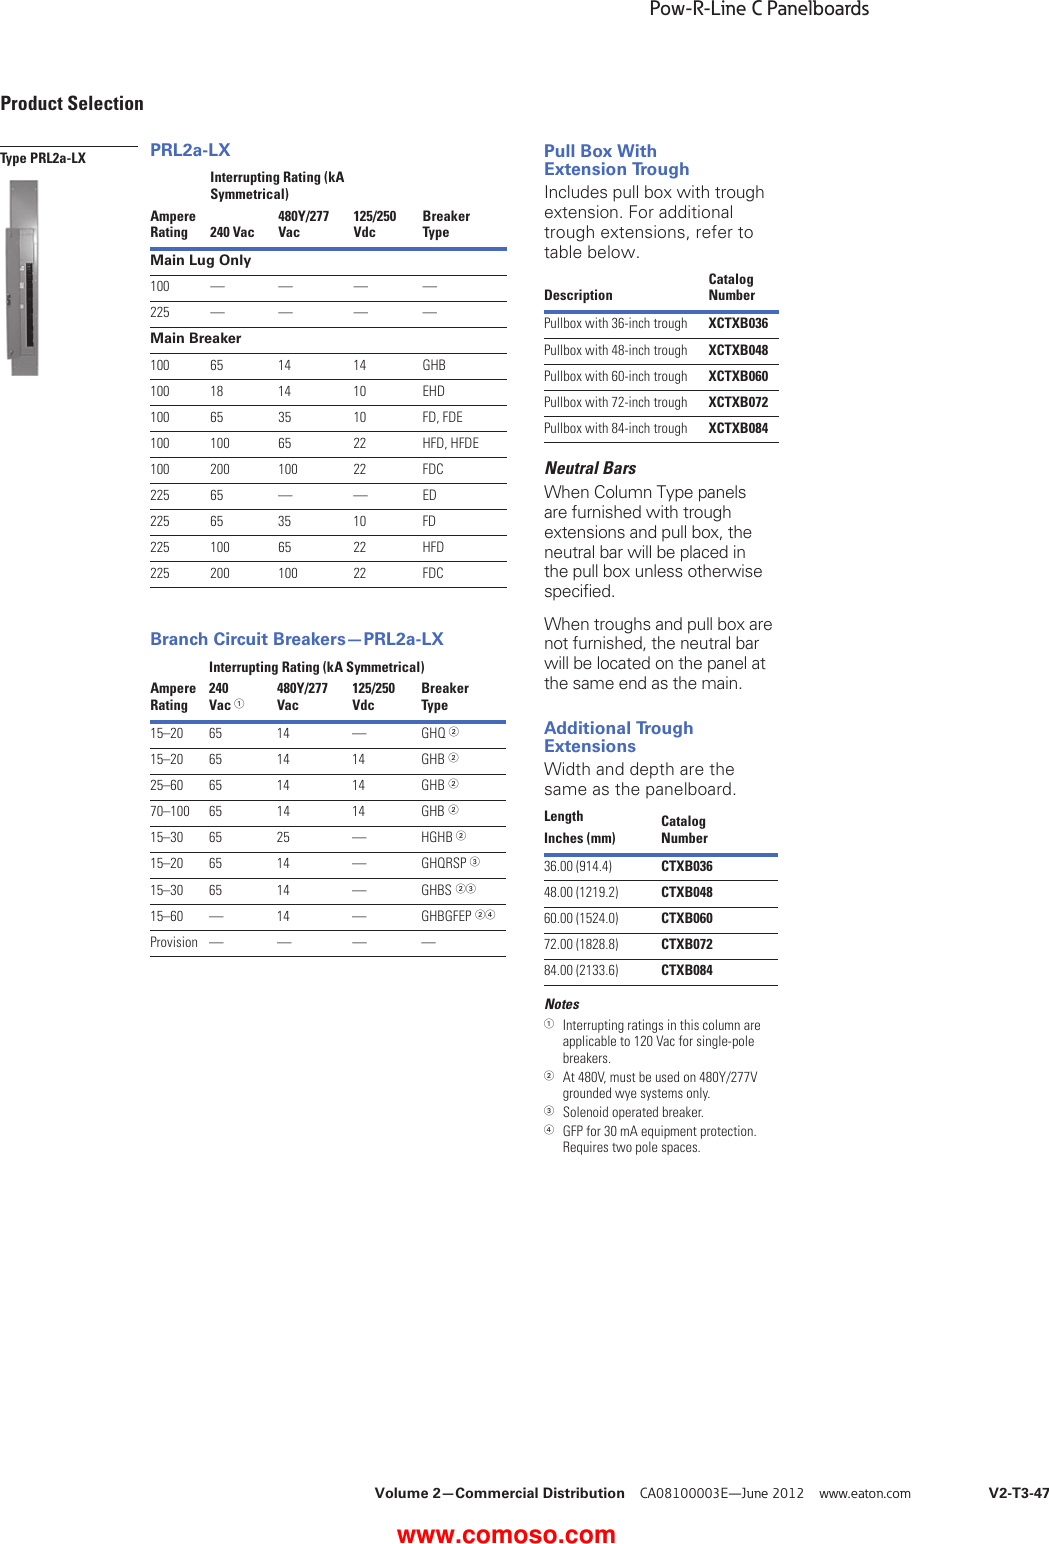 2 Gas Spring/Prop/Strut/Shock 10 x 7 x 100 LB Pressure Automotive